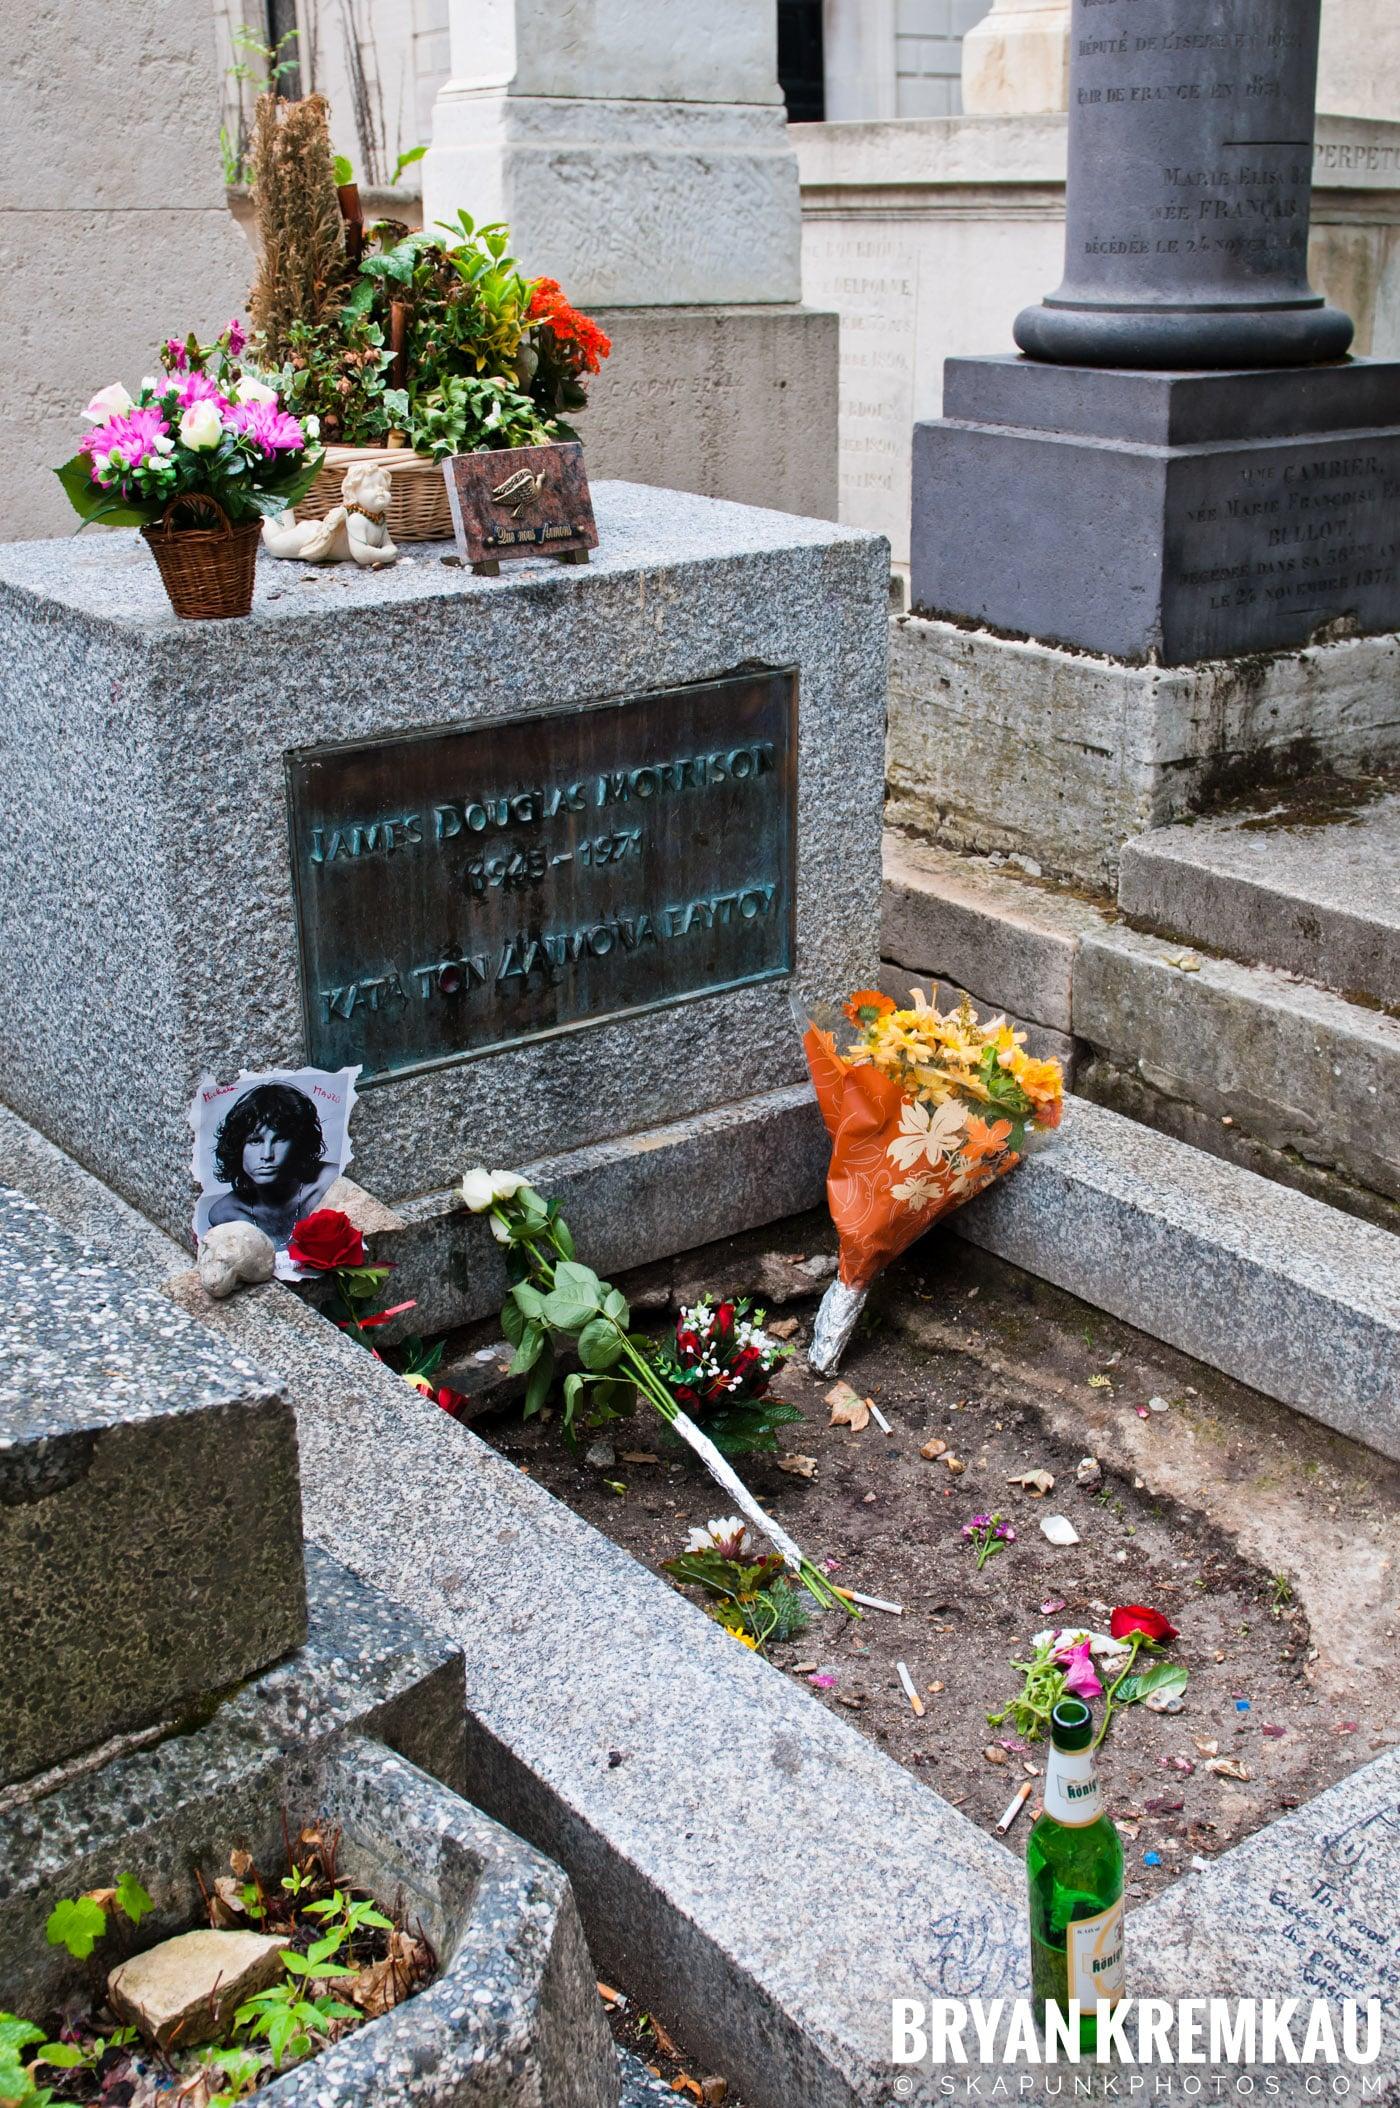 Paris, France Honeymoon - Day 5 - 7.22.11 (33)